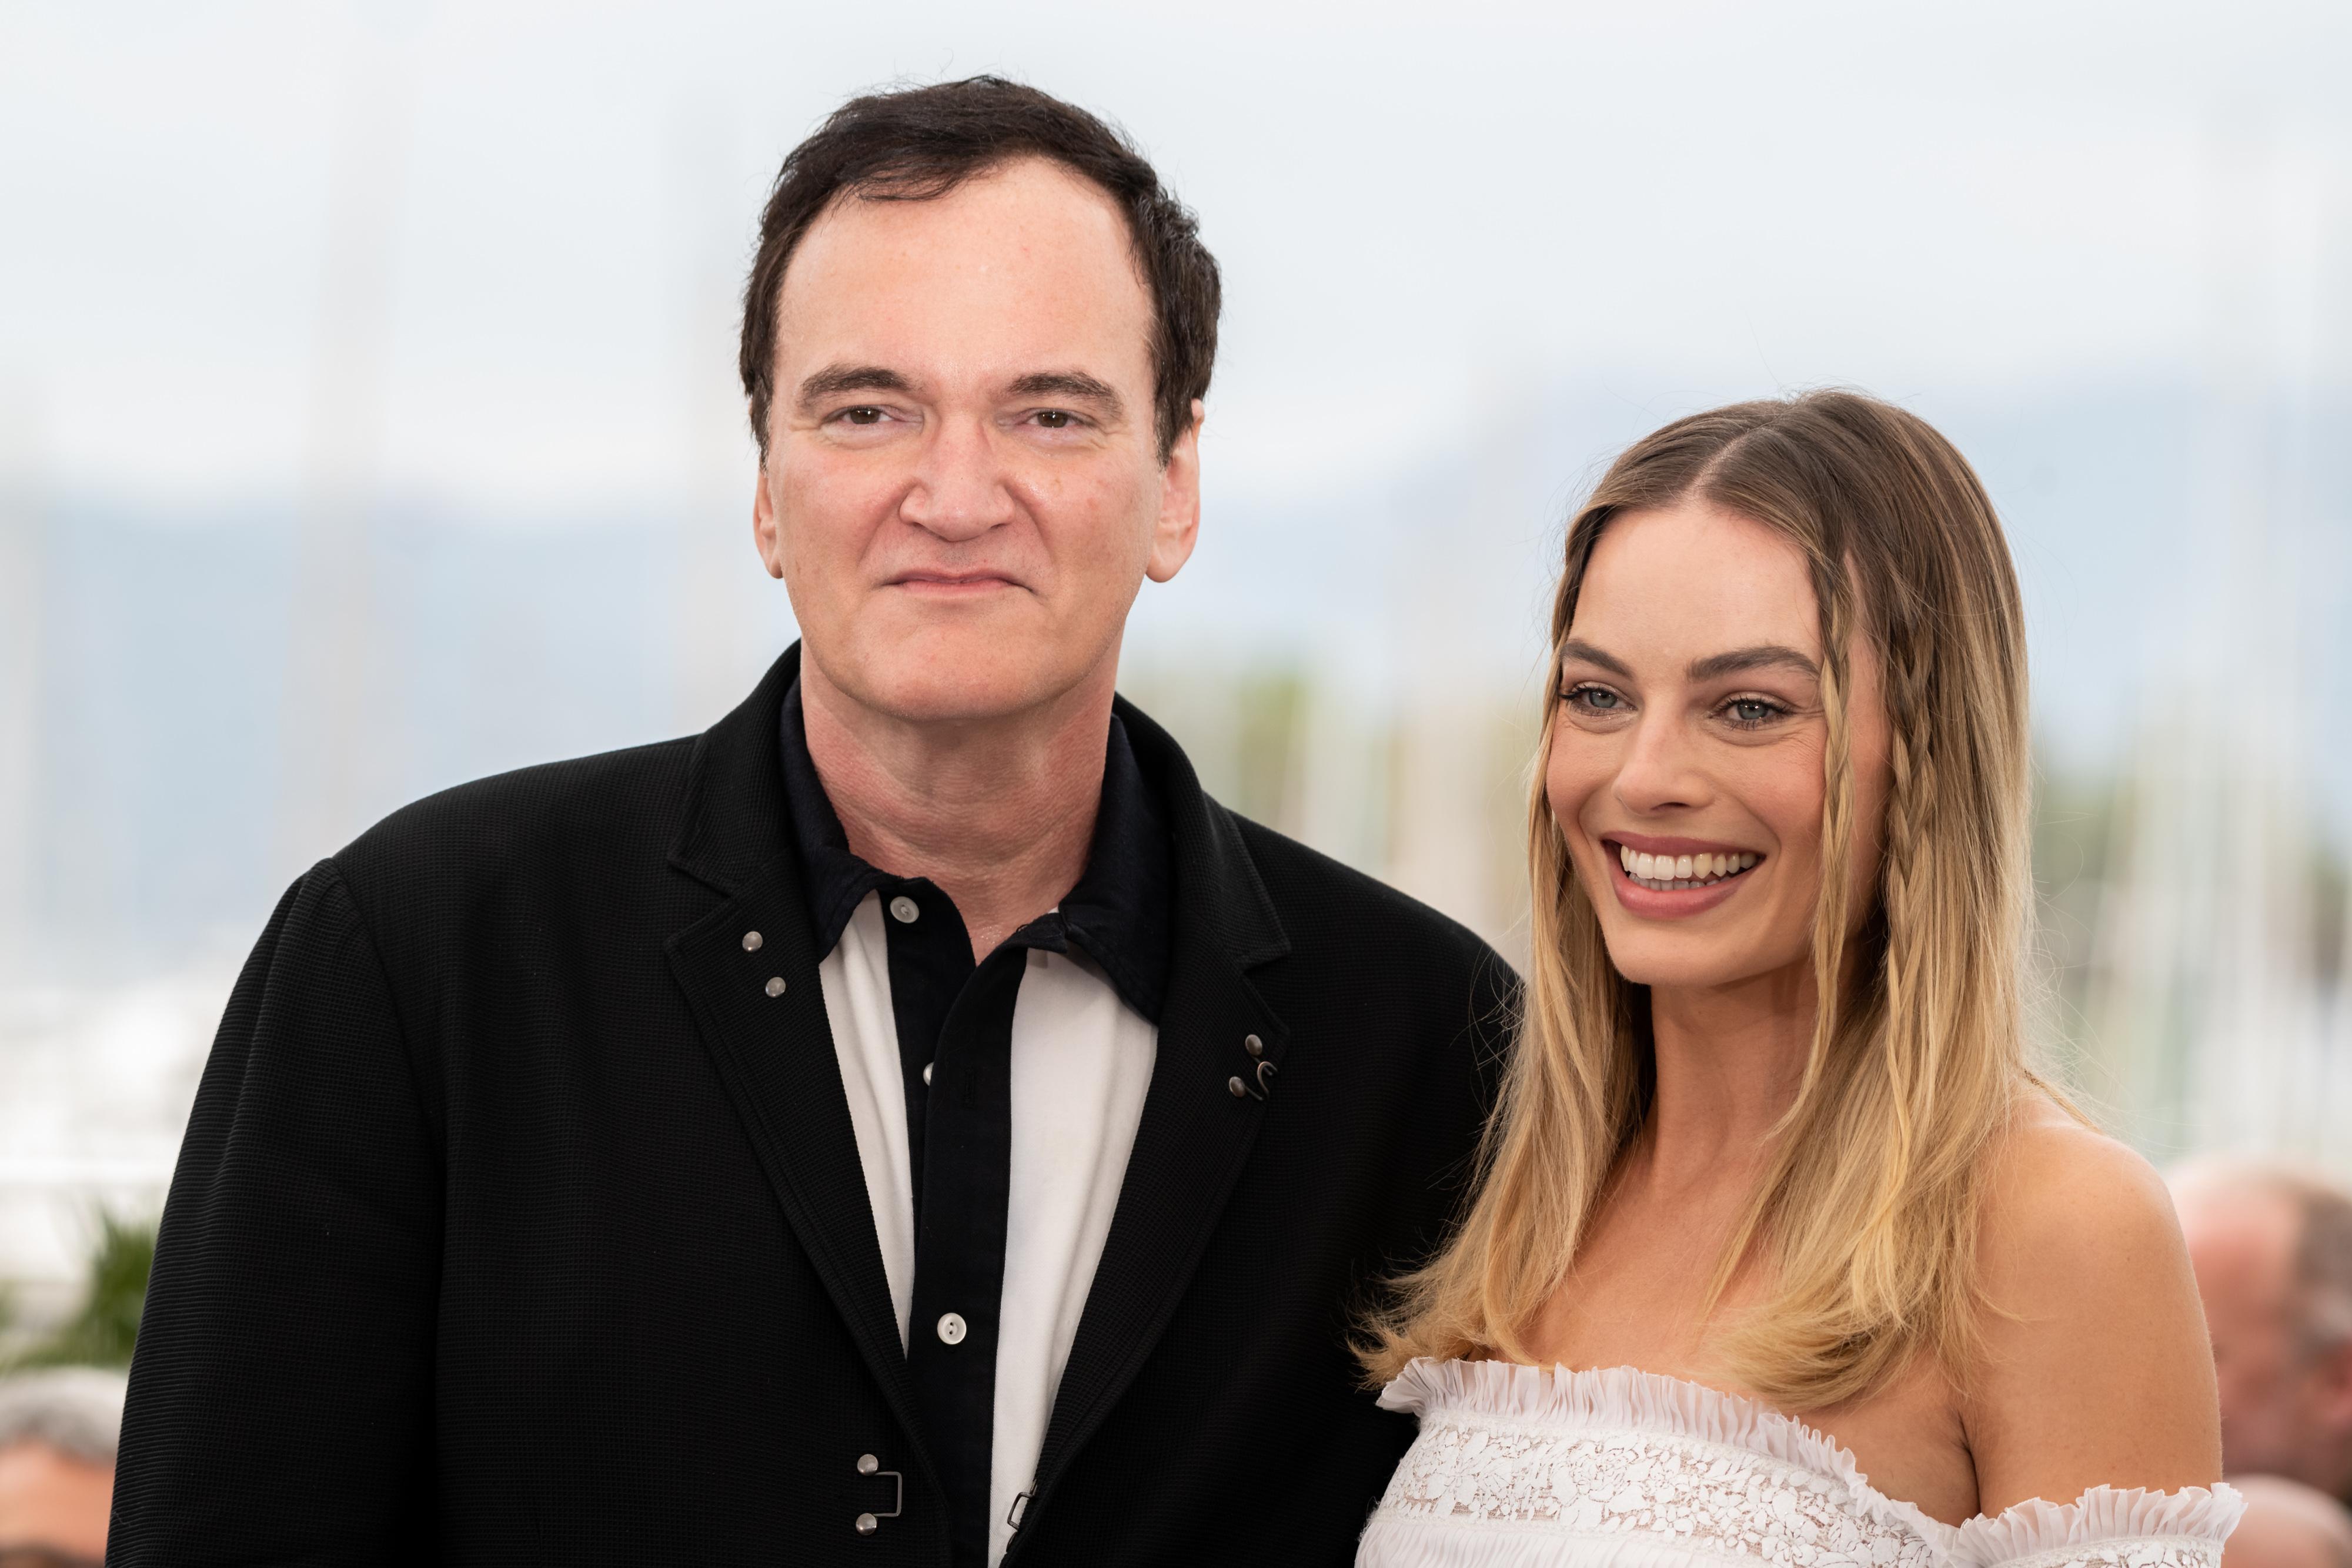 Margot Robbie on Working With Tarantino After Uma Thurman's 'Kill Bill' Car Crash Reveal